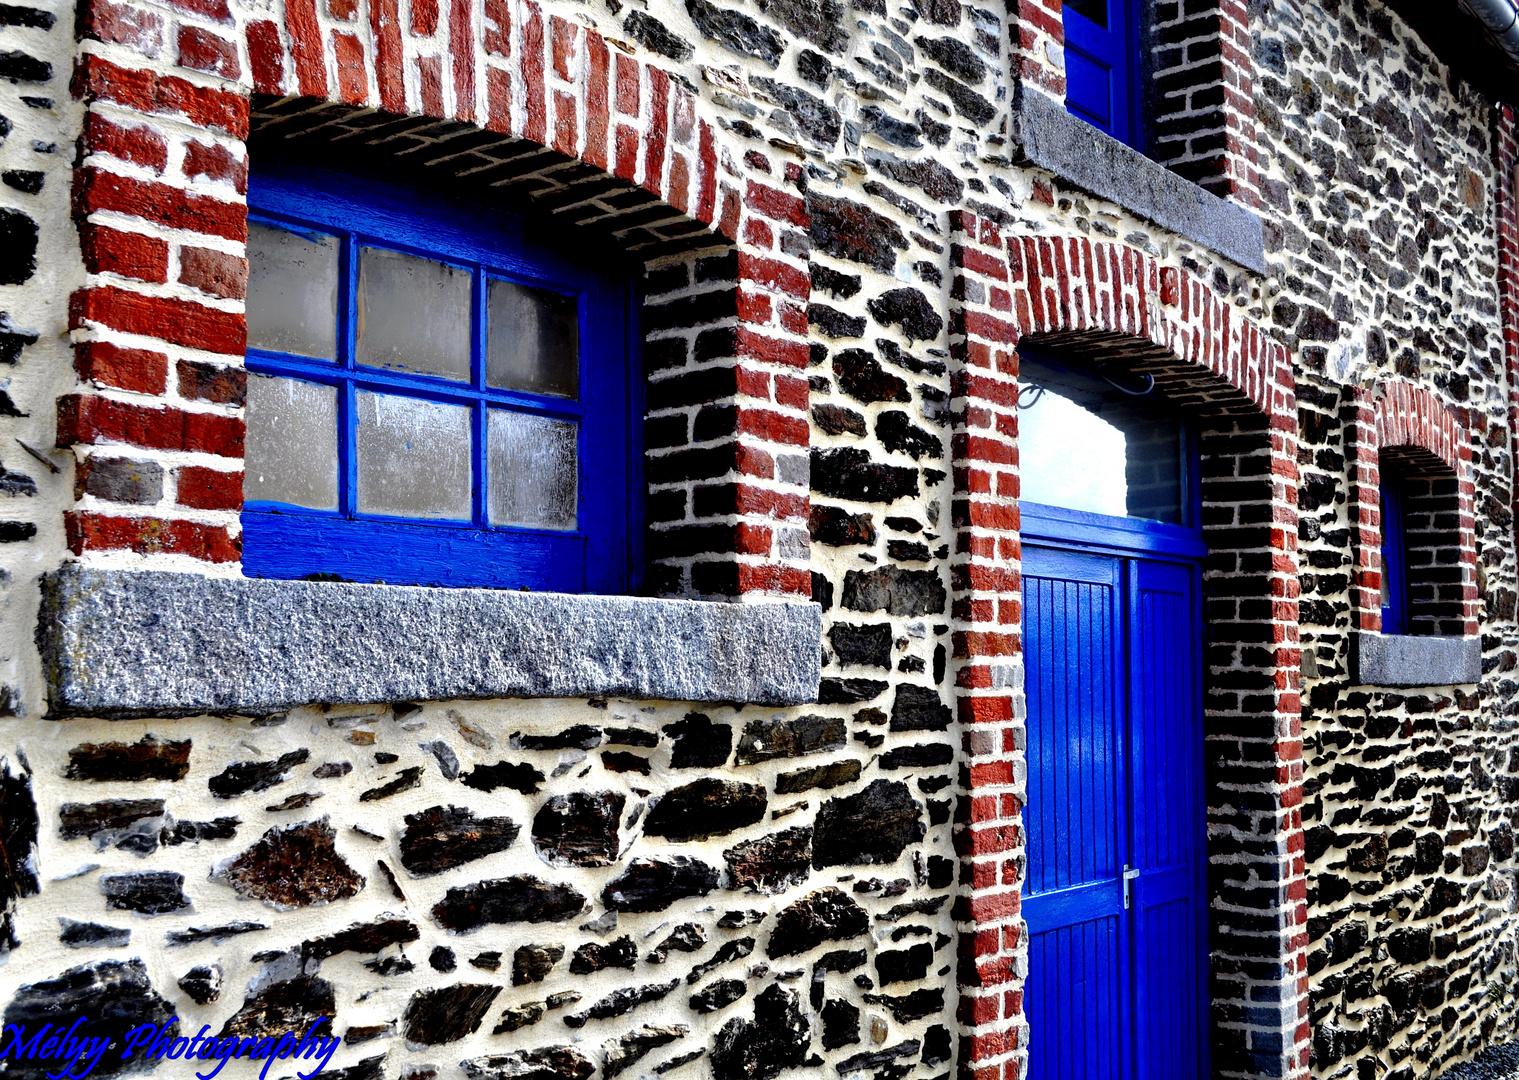 La façade bleue